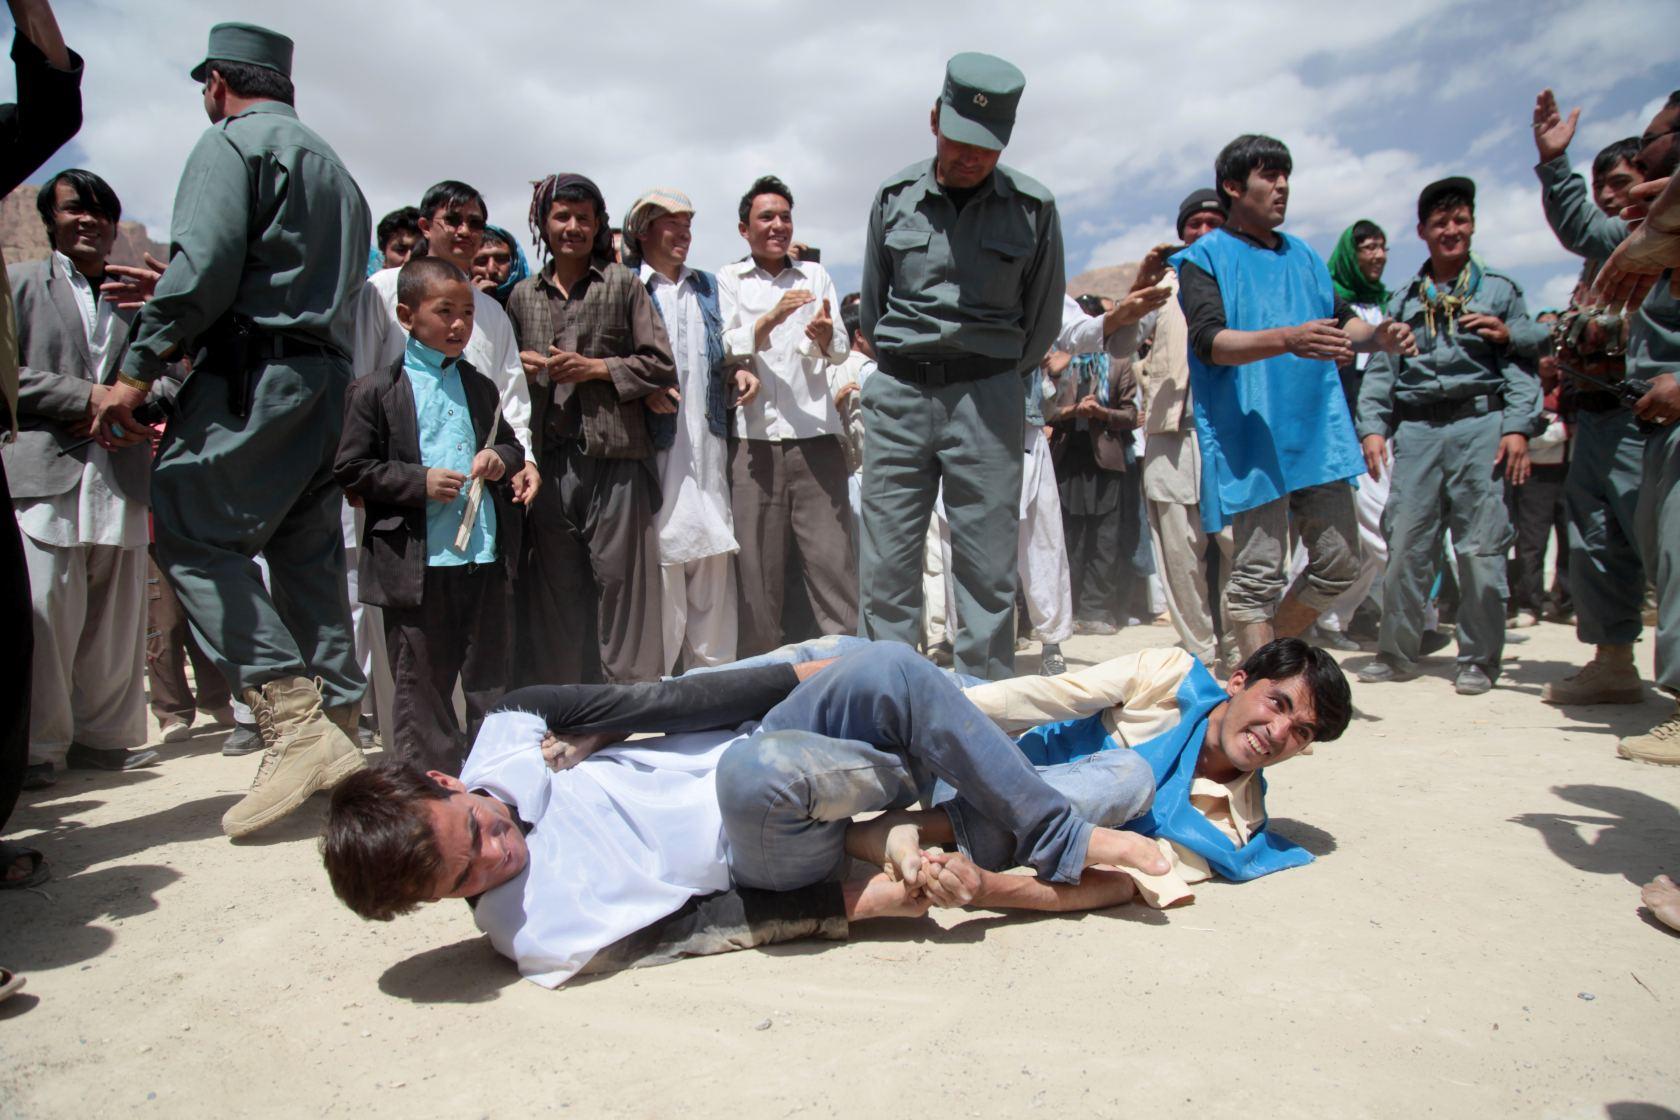 bamiyan-afghanistan-ulyces-03